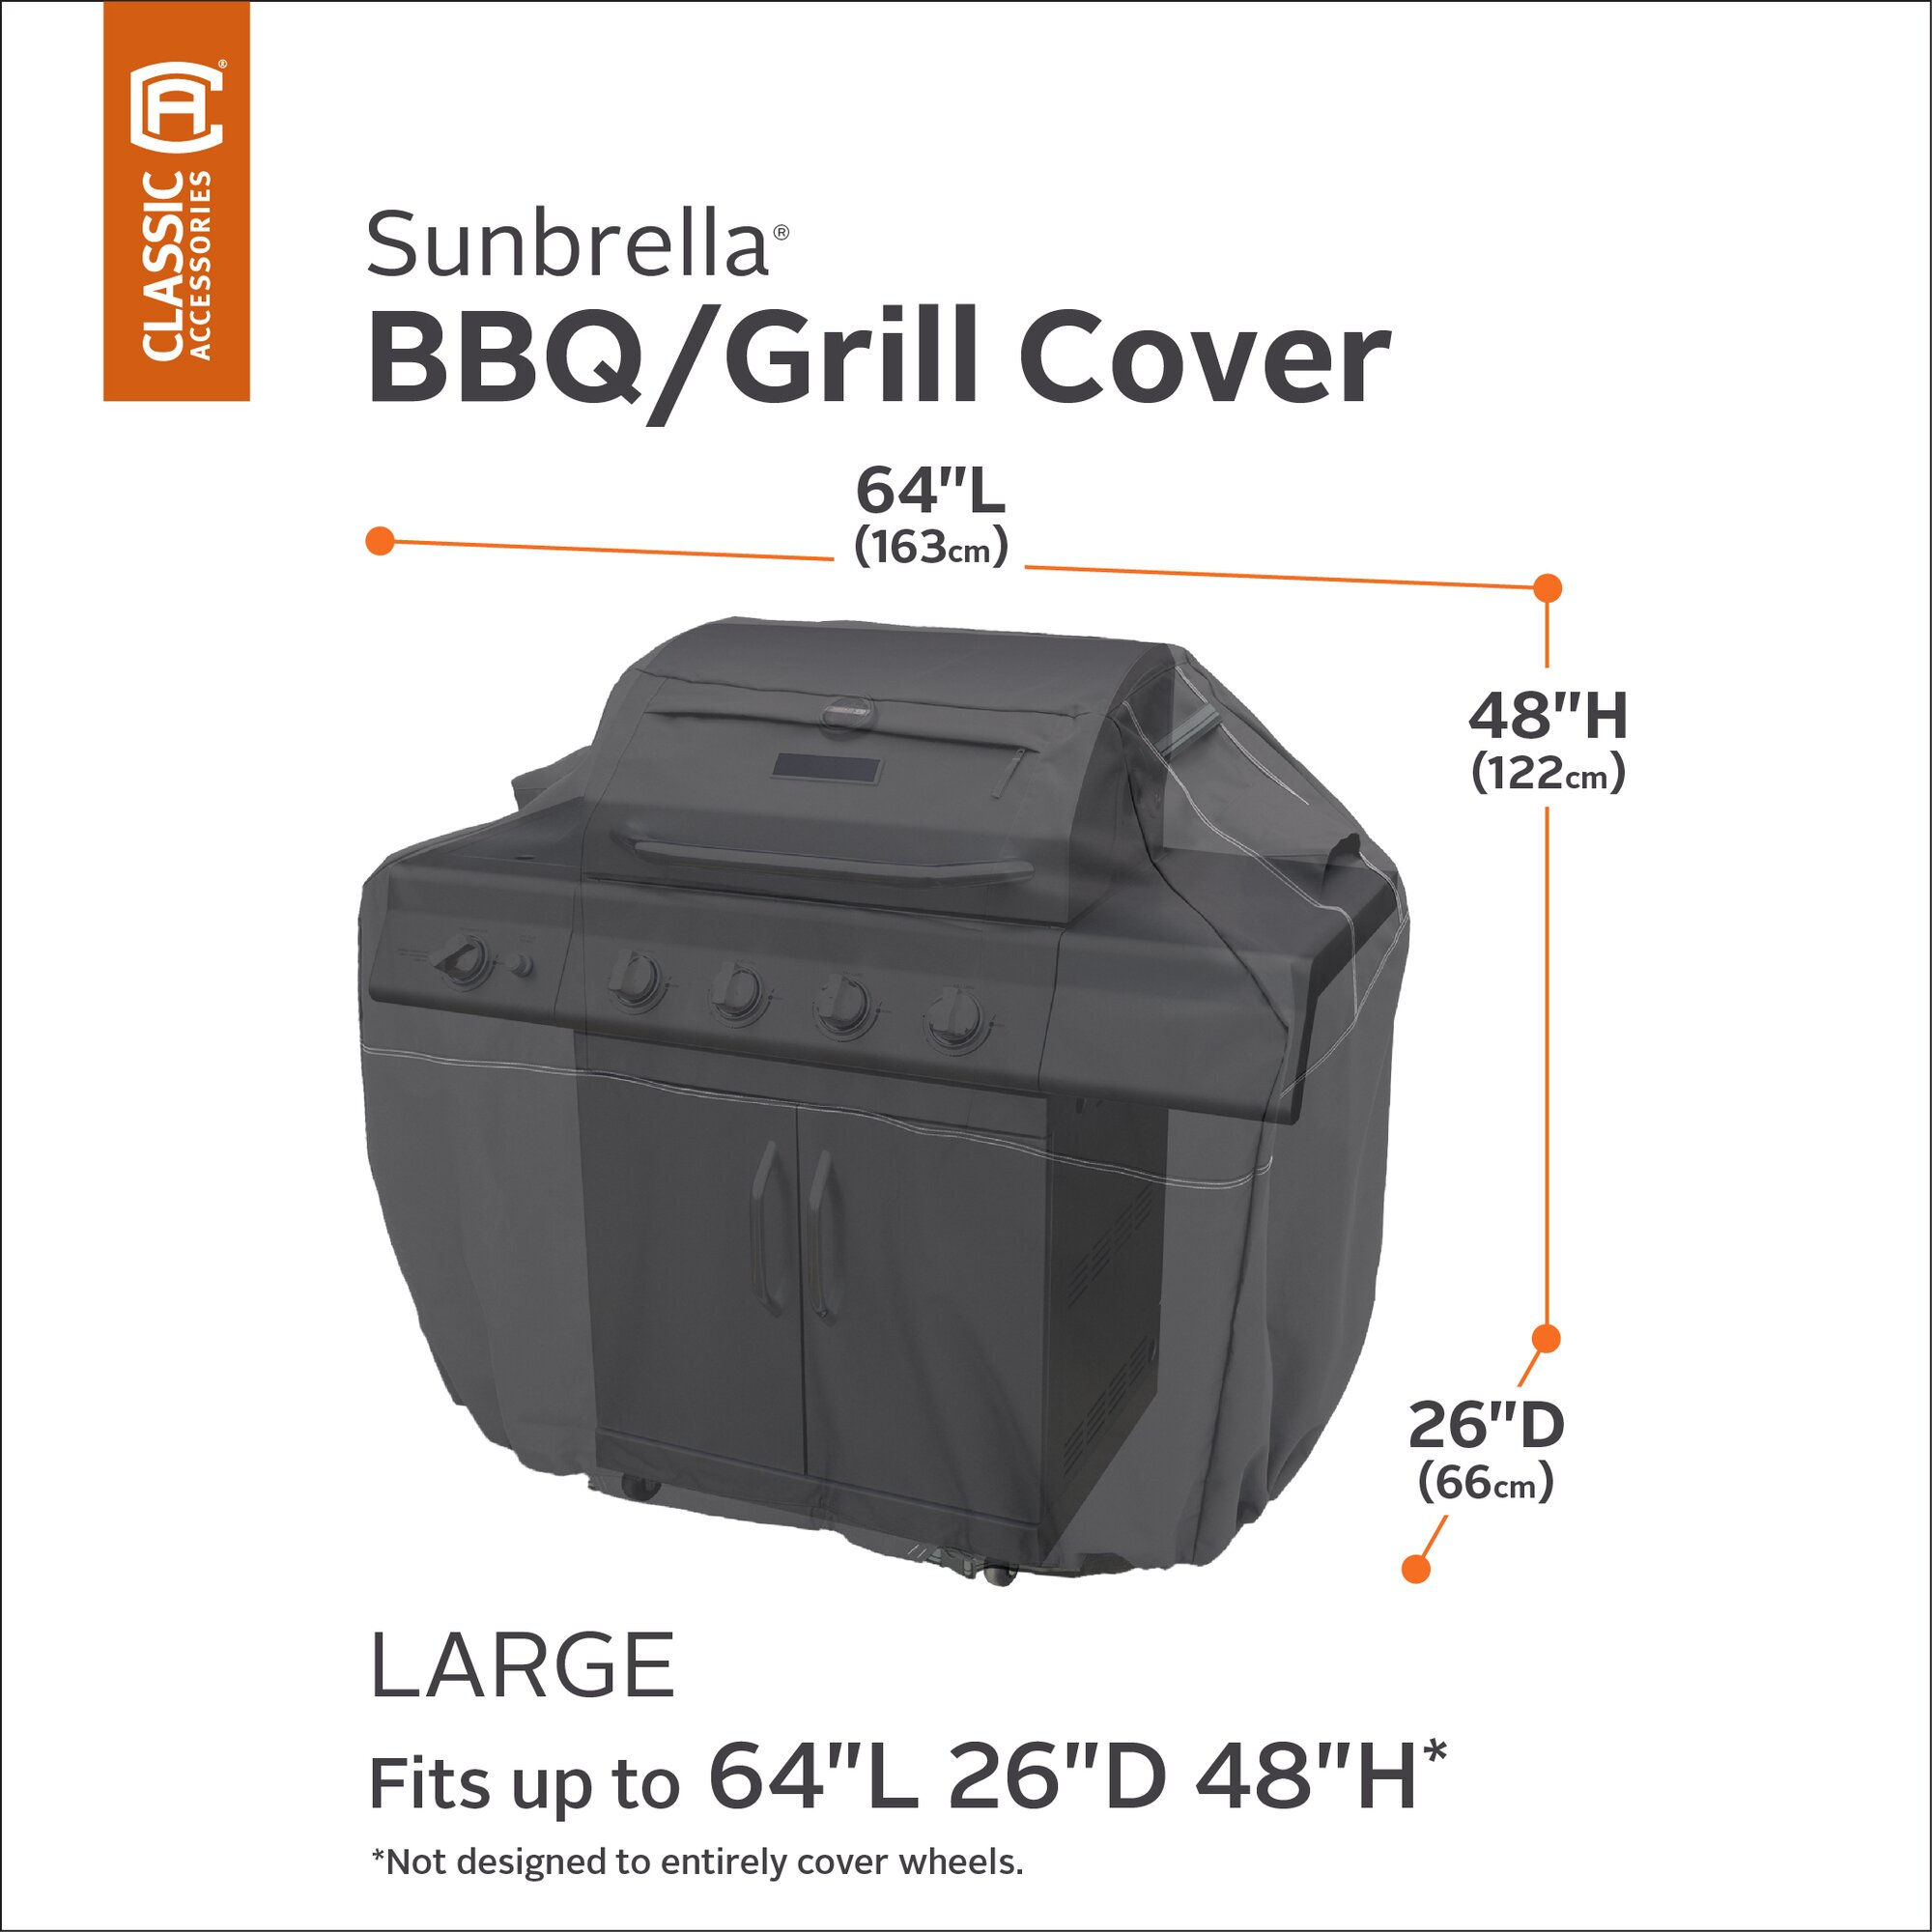 Classic Accessories Sunbrella Bbq Grill Cover Wayfair Ca